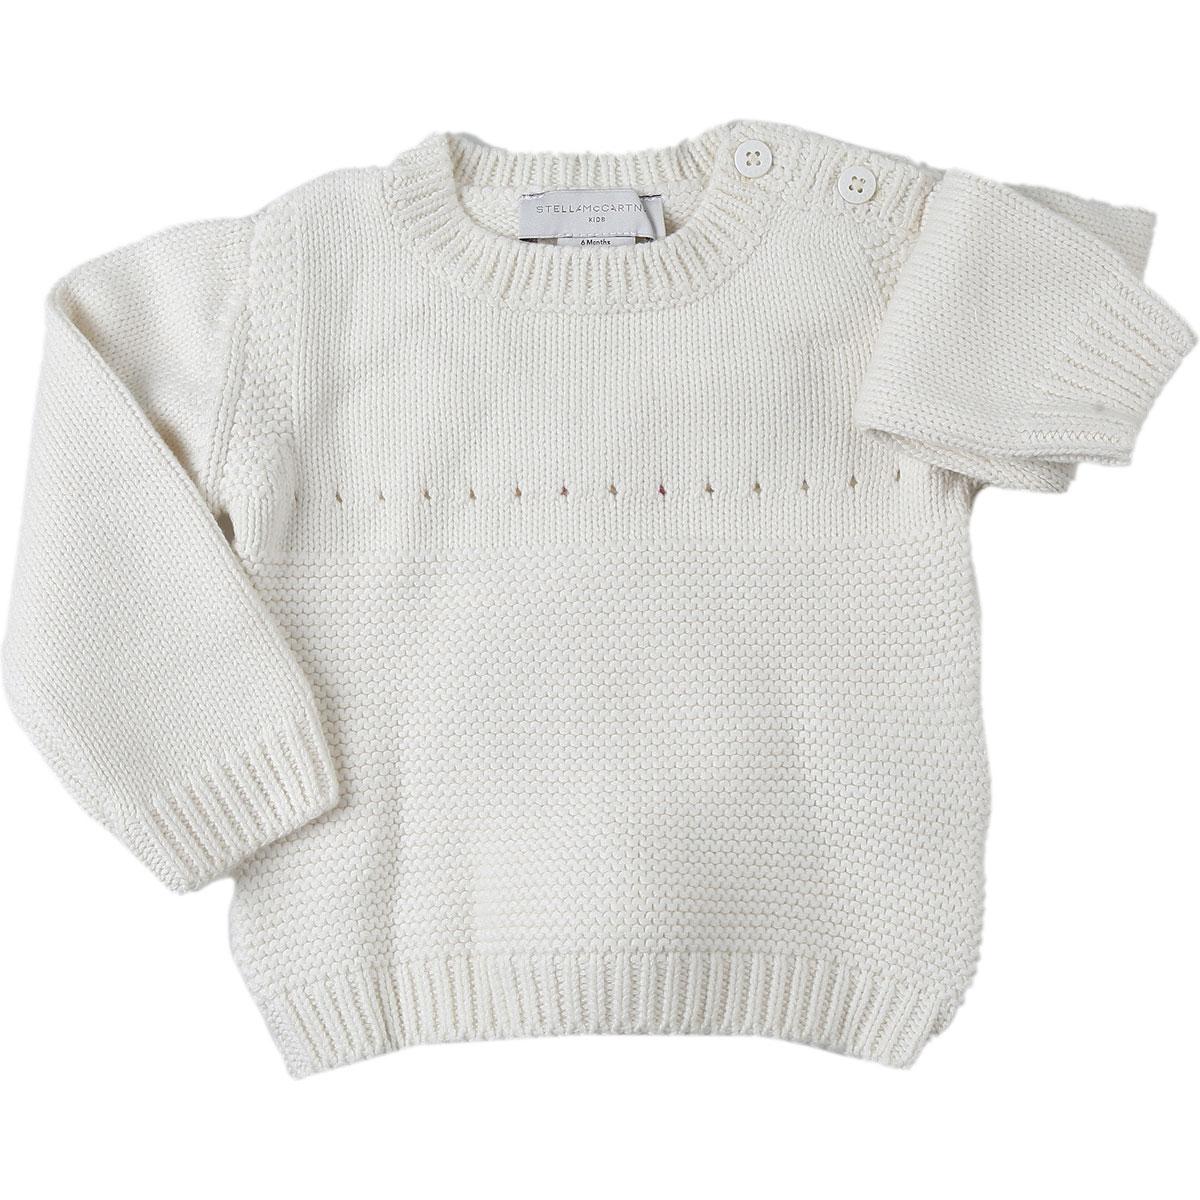 Stella McCartney Baby Sweaters for Girls On Sale, Cream, Cotton, 2019, 12M 18M 3M 6M 9M